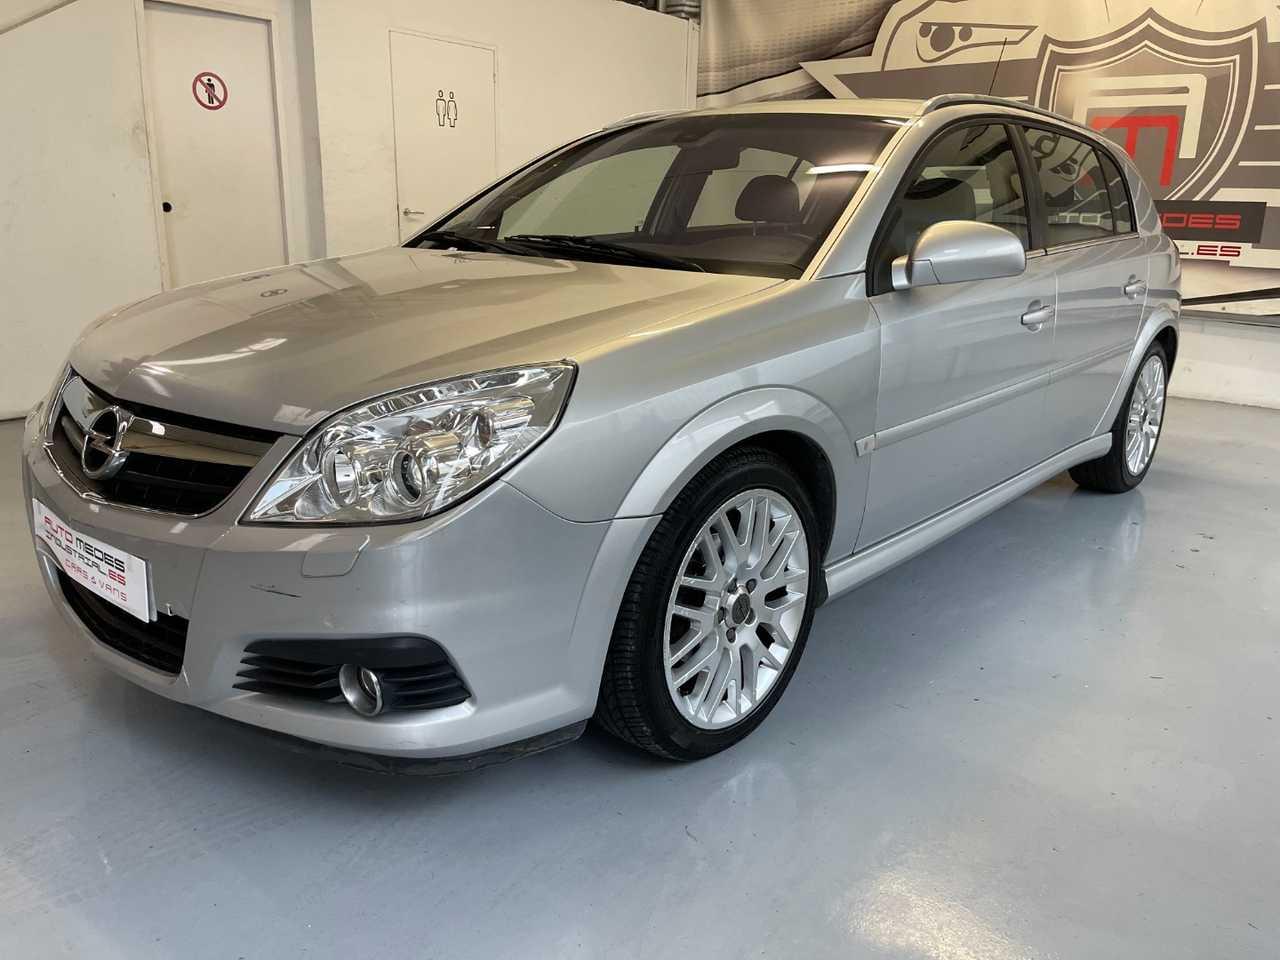 Opel Signum 1.9 CDTi 150cv 16v   - Foto 1